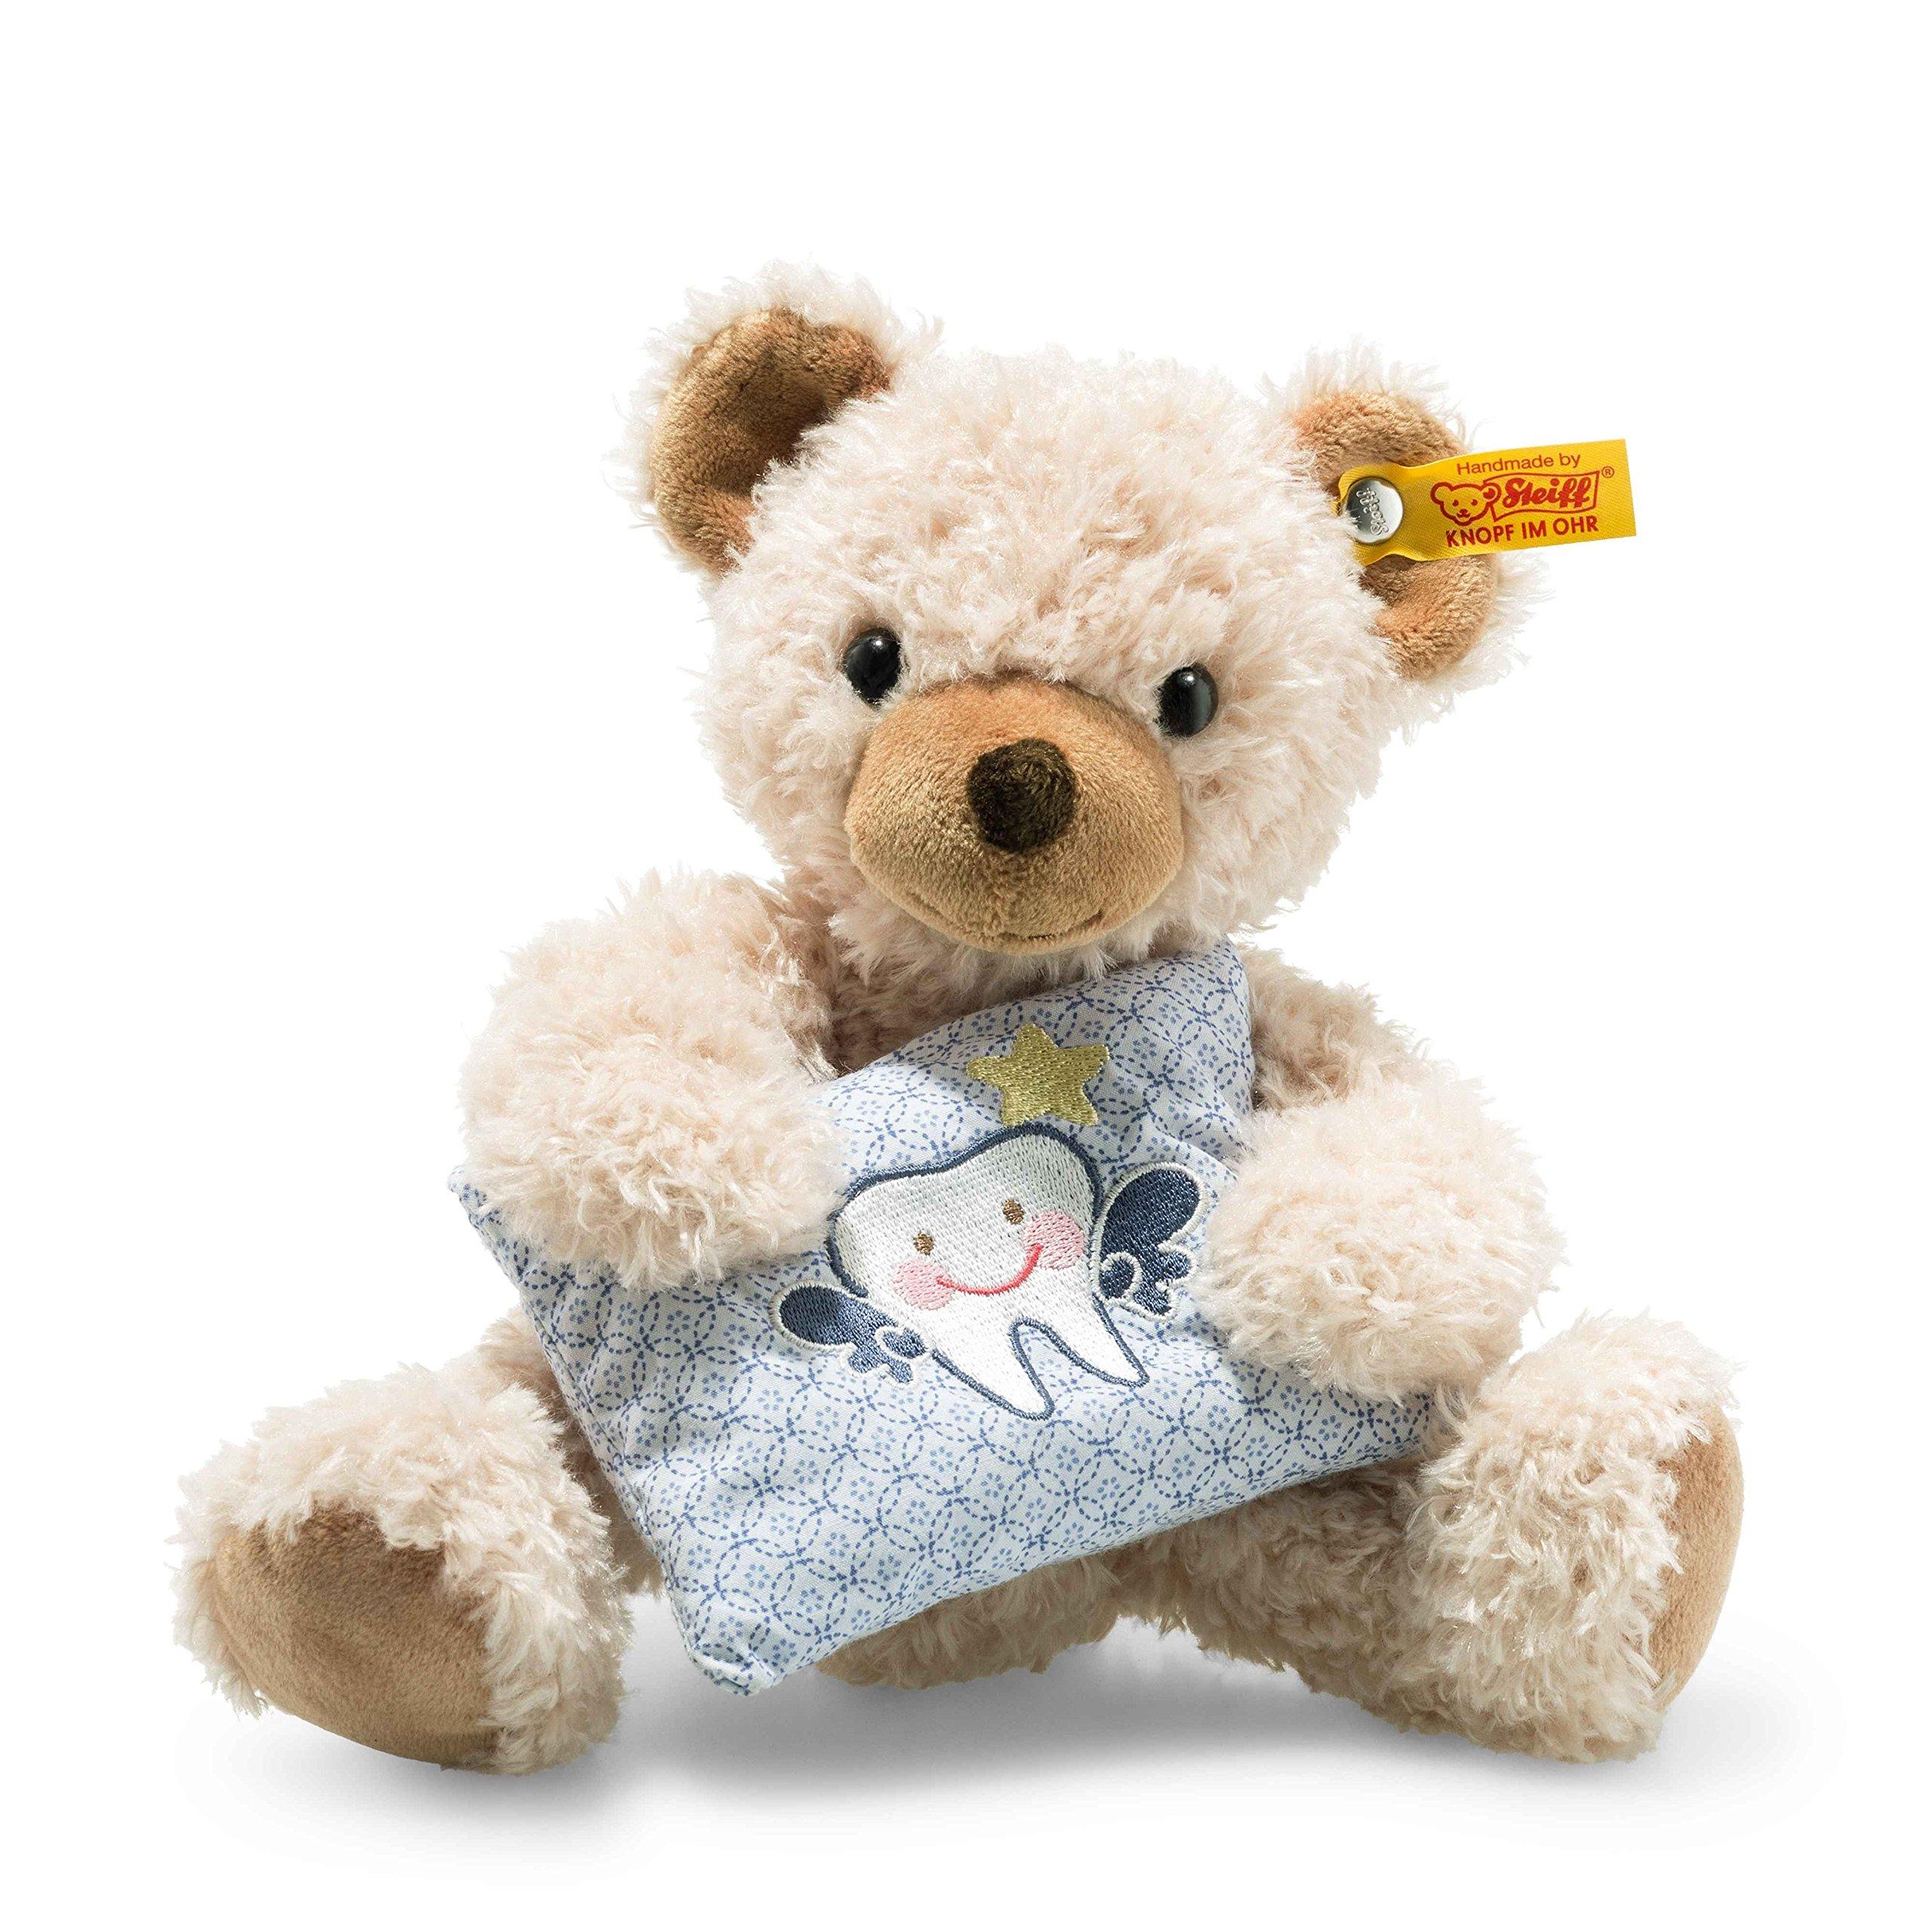 Steiff 113383 Leo Tooth Fairy Bear Plush Animal Toy, Beige by Steiff